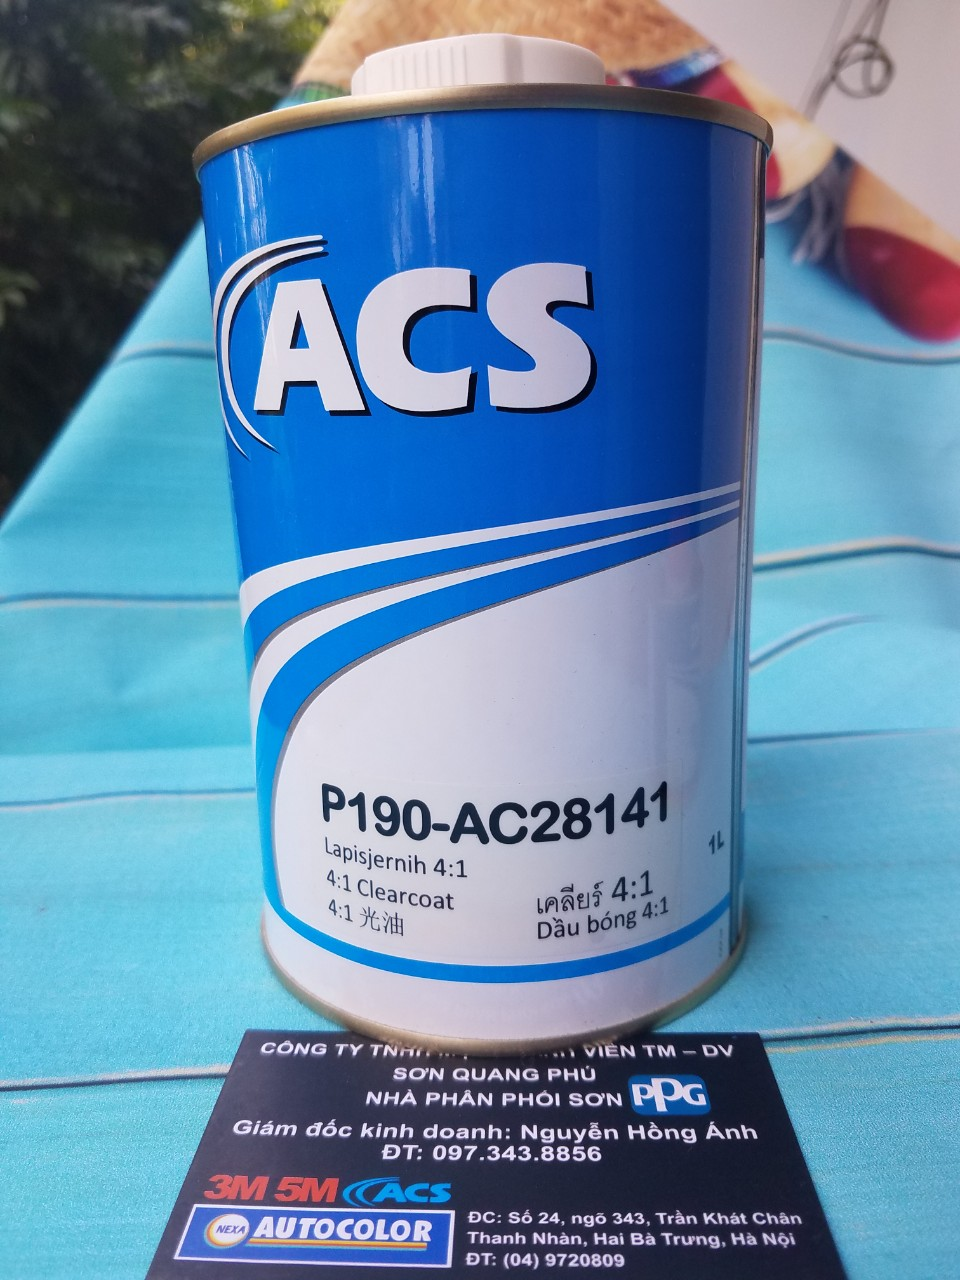 p190-ac28141-dau-bong-acs-nhanh-kho-ti-le-4-1